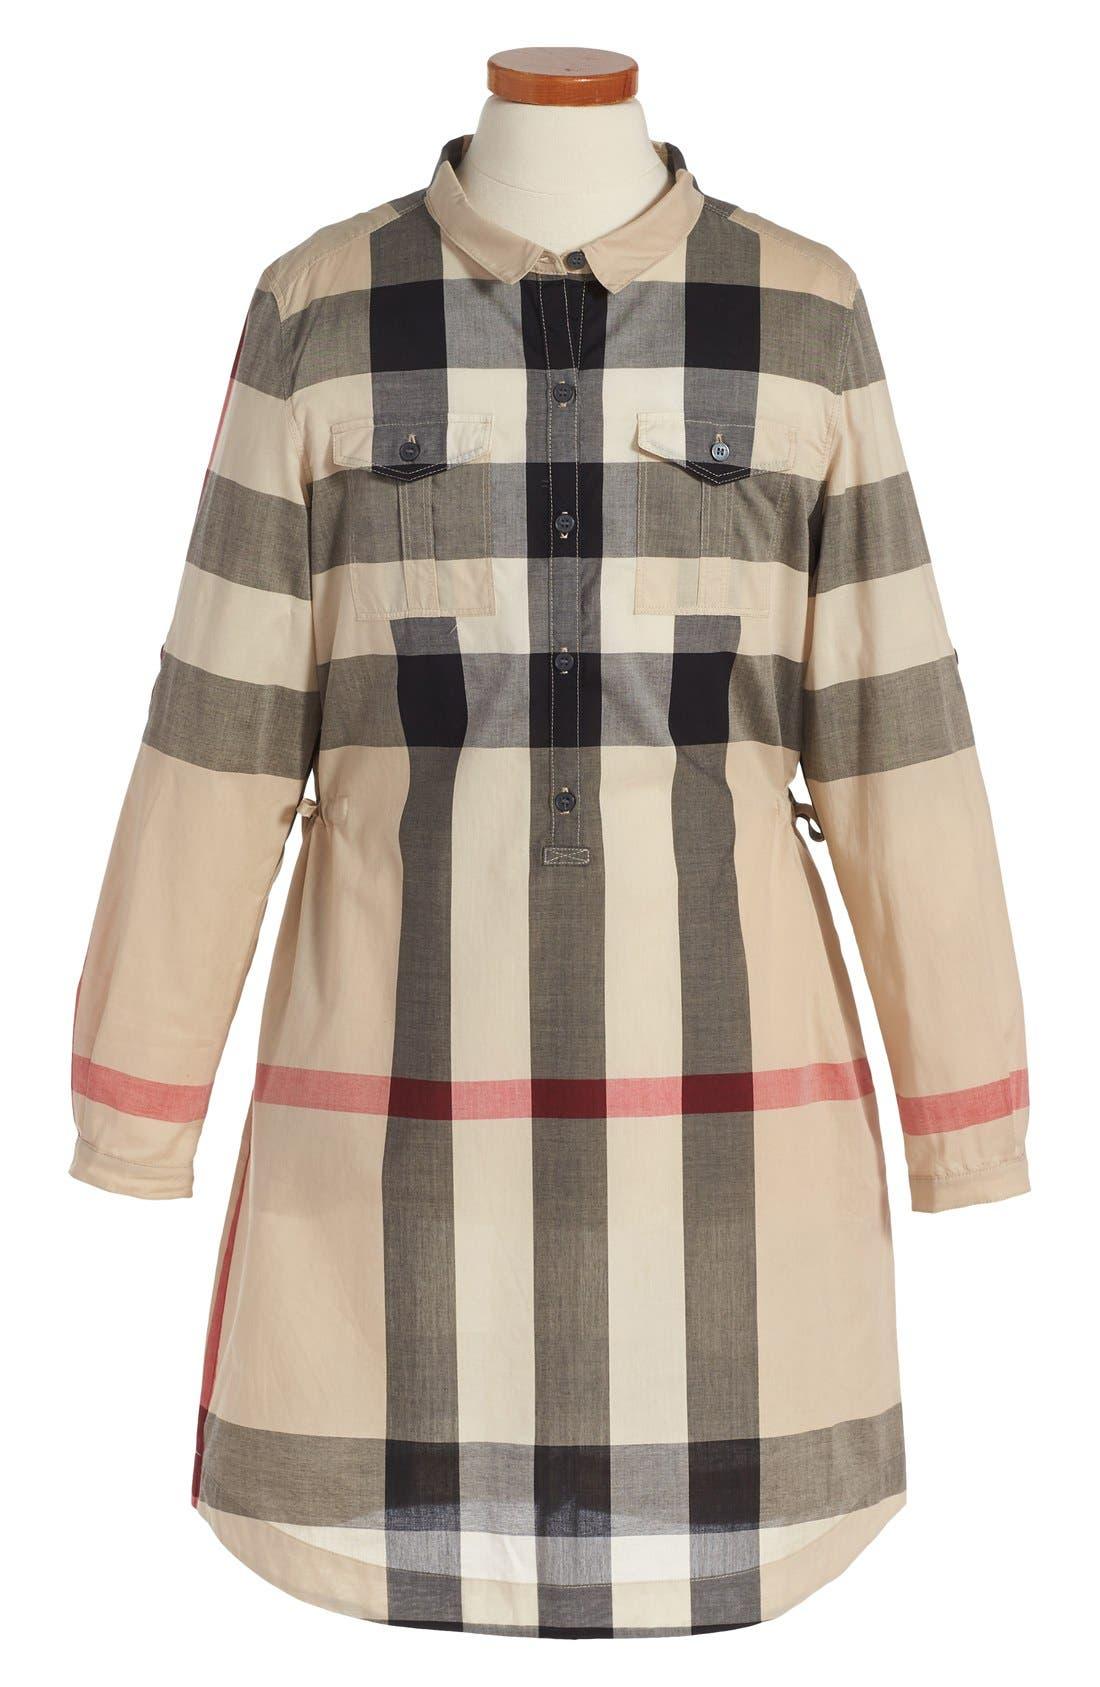 Main Image - Burberry 'Darielle' Check Print Dress (Little Girls & Big Girls)